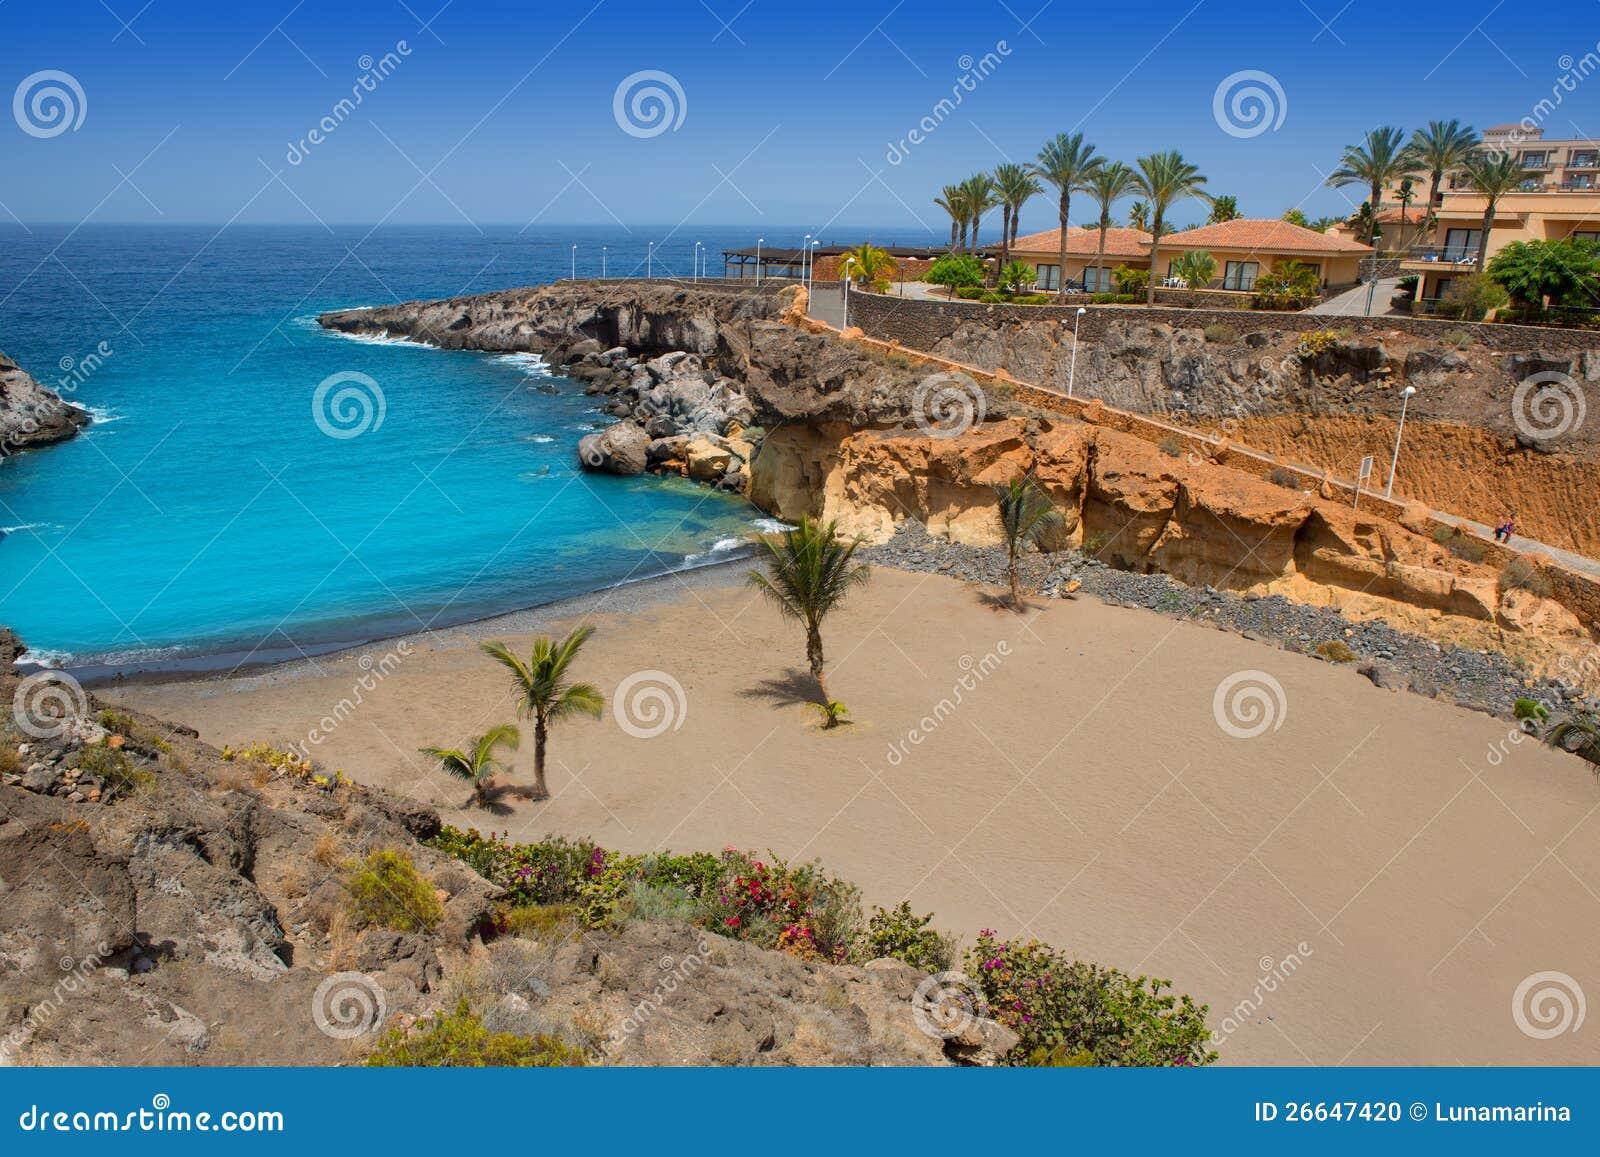 Beach Playa Paraiso Costa Adeje In Tenerife Stock Photo - Image ...